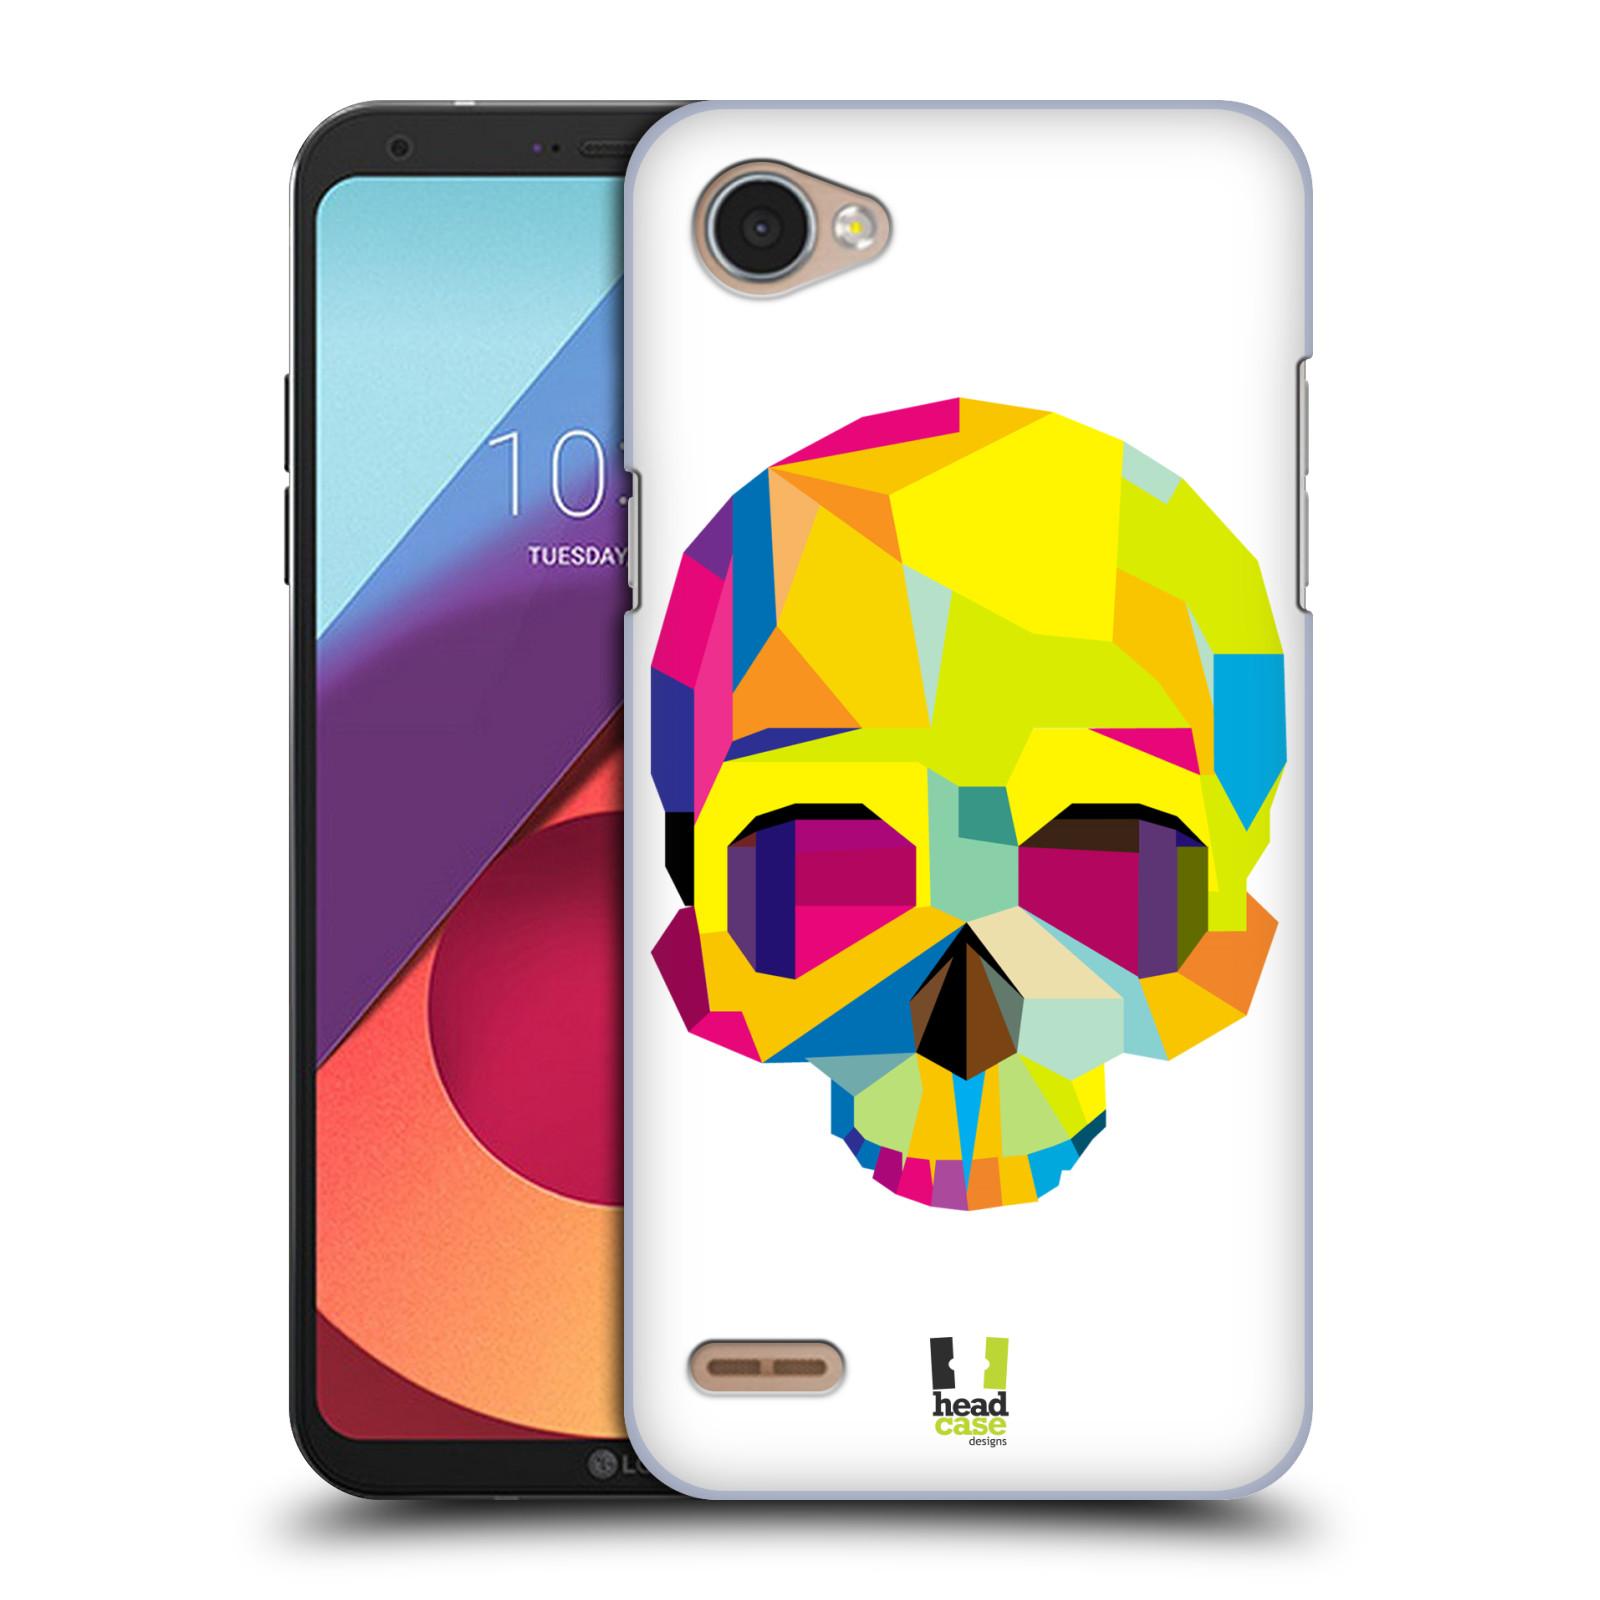 HEAD CASE plastový obal na mobil LG Q6 / Q6 PLUS vzor POP ART kubismus smrtelnost